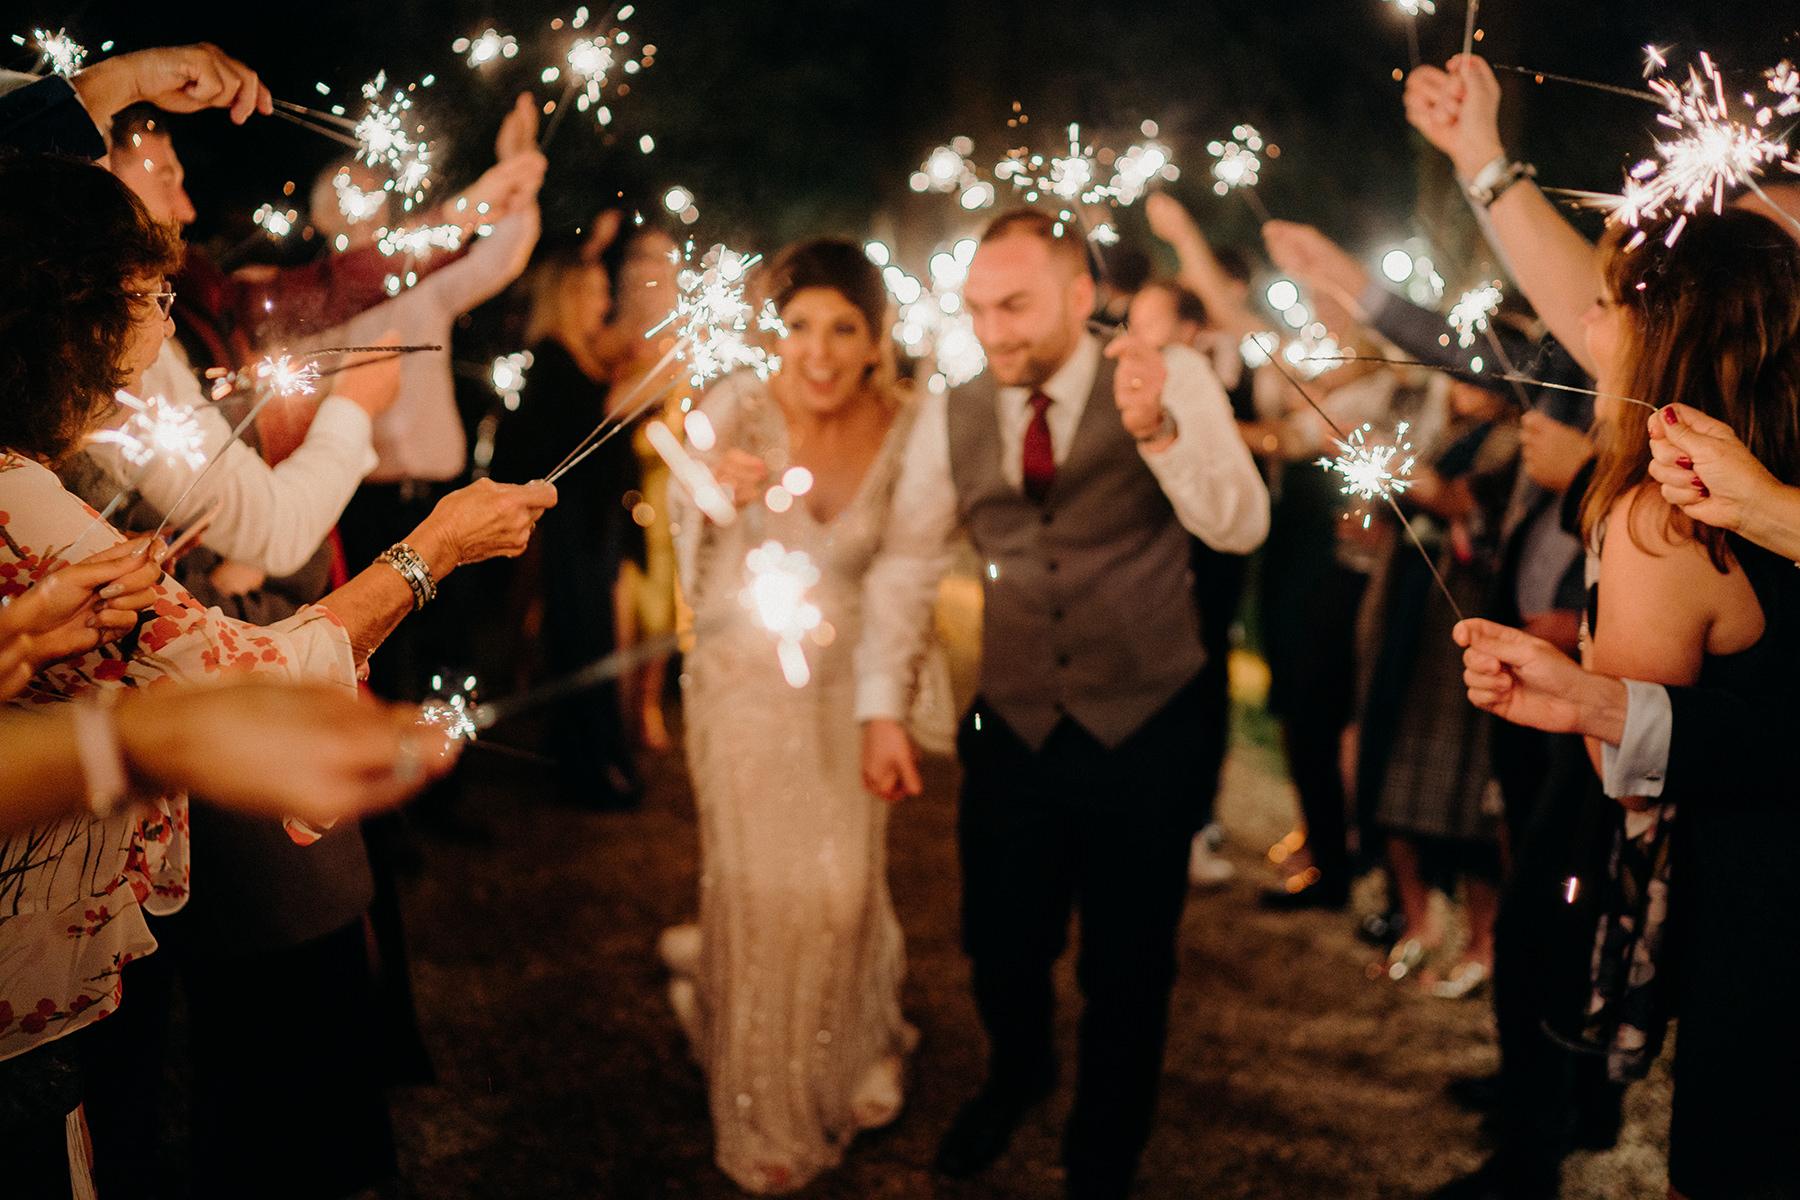 Amazing Sparkles Wedding Photos - How to do it ? 2